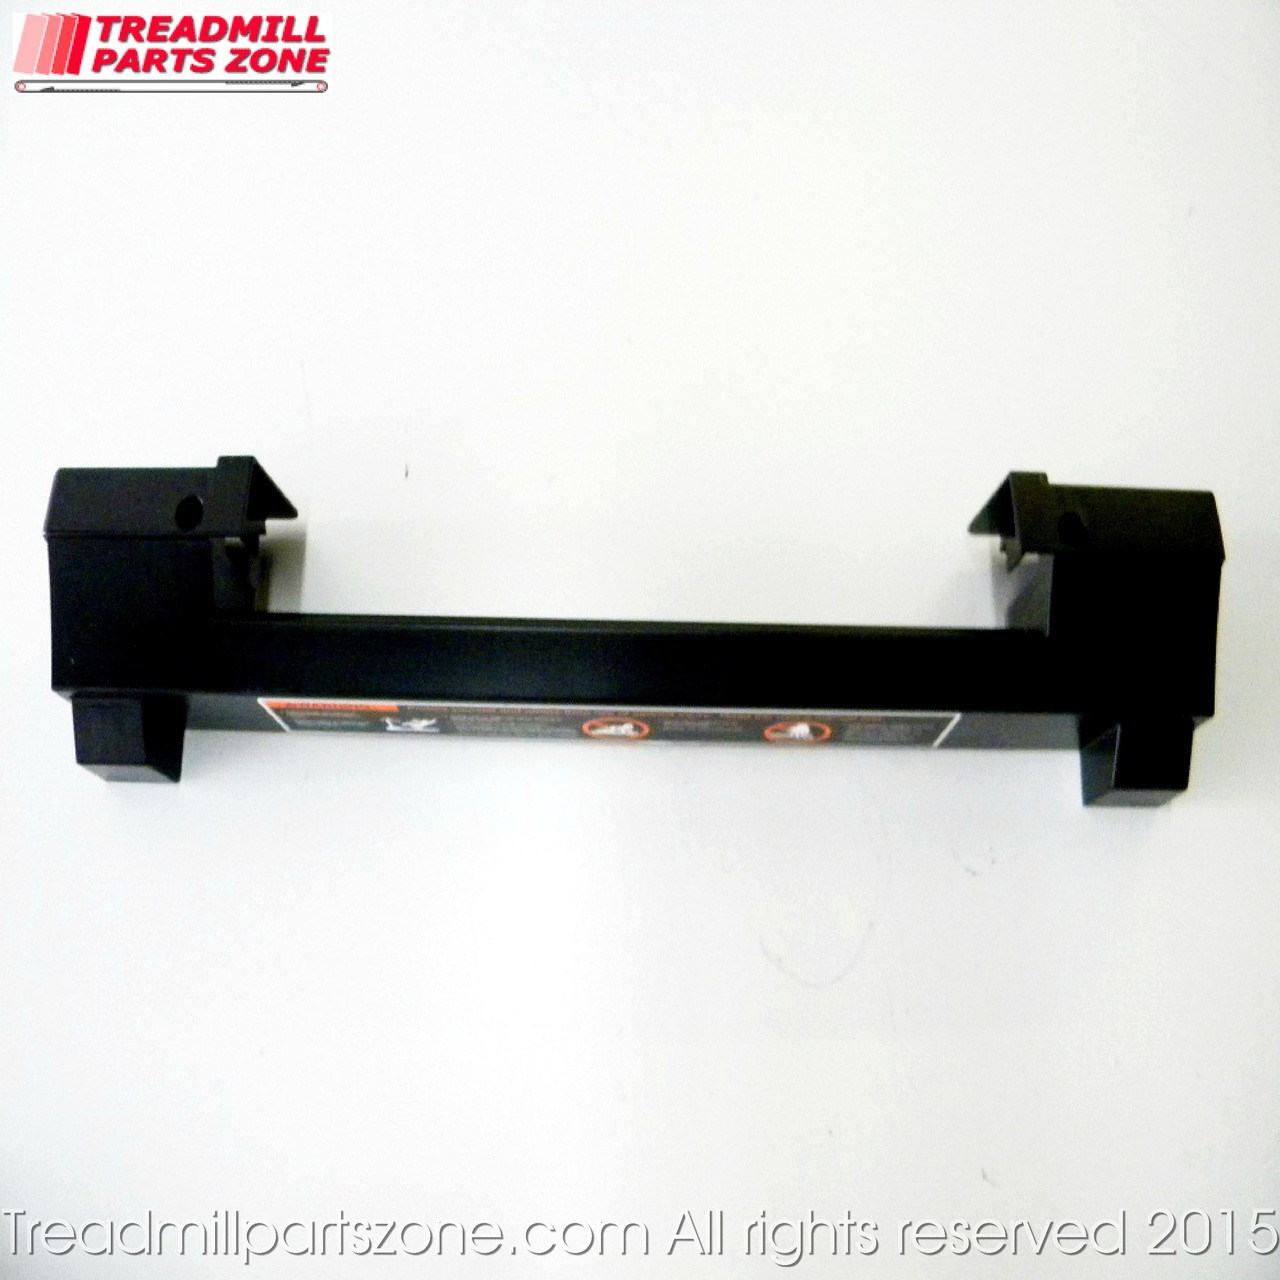 Nordic Track Treadmill Model NTTL17900 SUMMIT 5500 Rear End Cap Part 174491